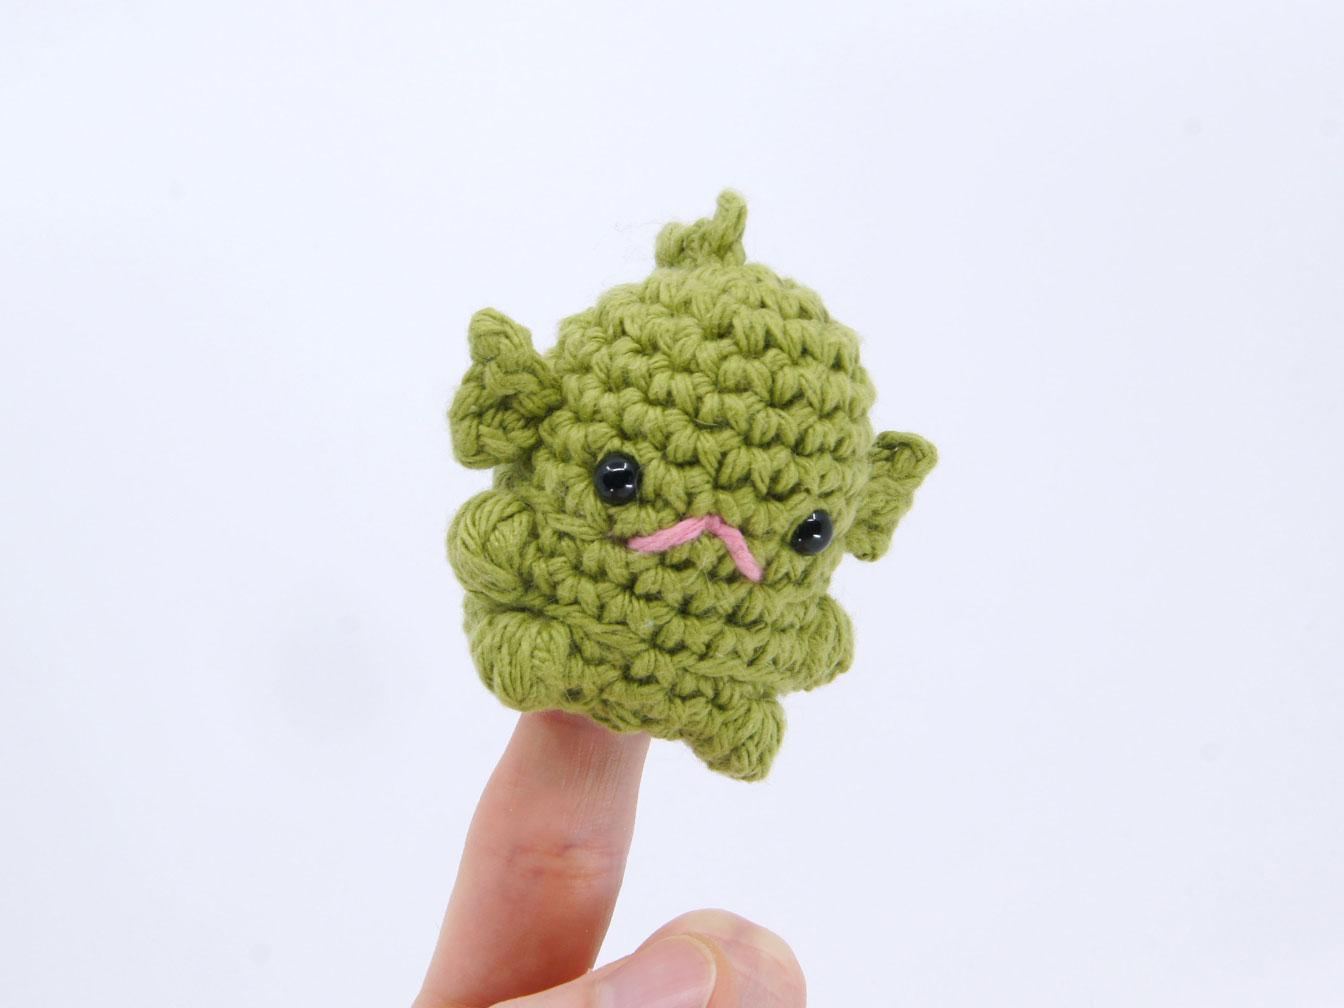 Swamp Monster Amigurumi Pod Person